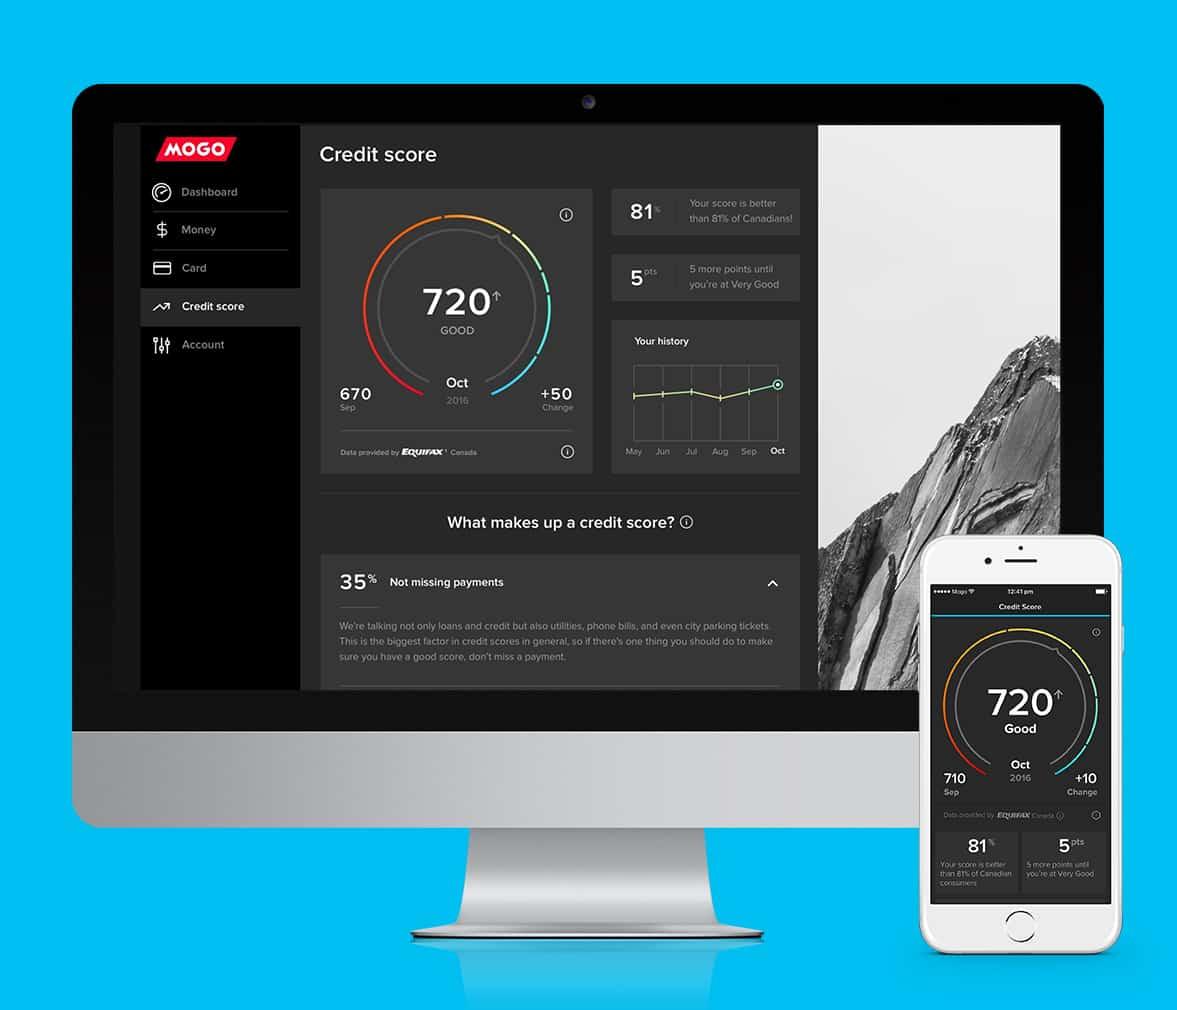 mogo_credit-score_dashboard-app_comparewise 1